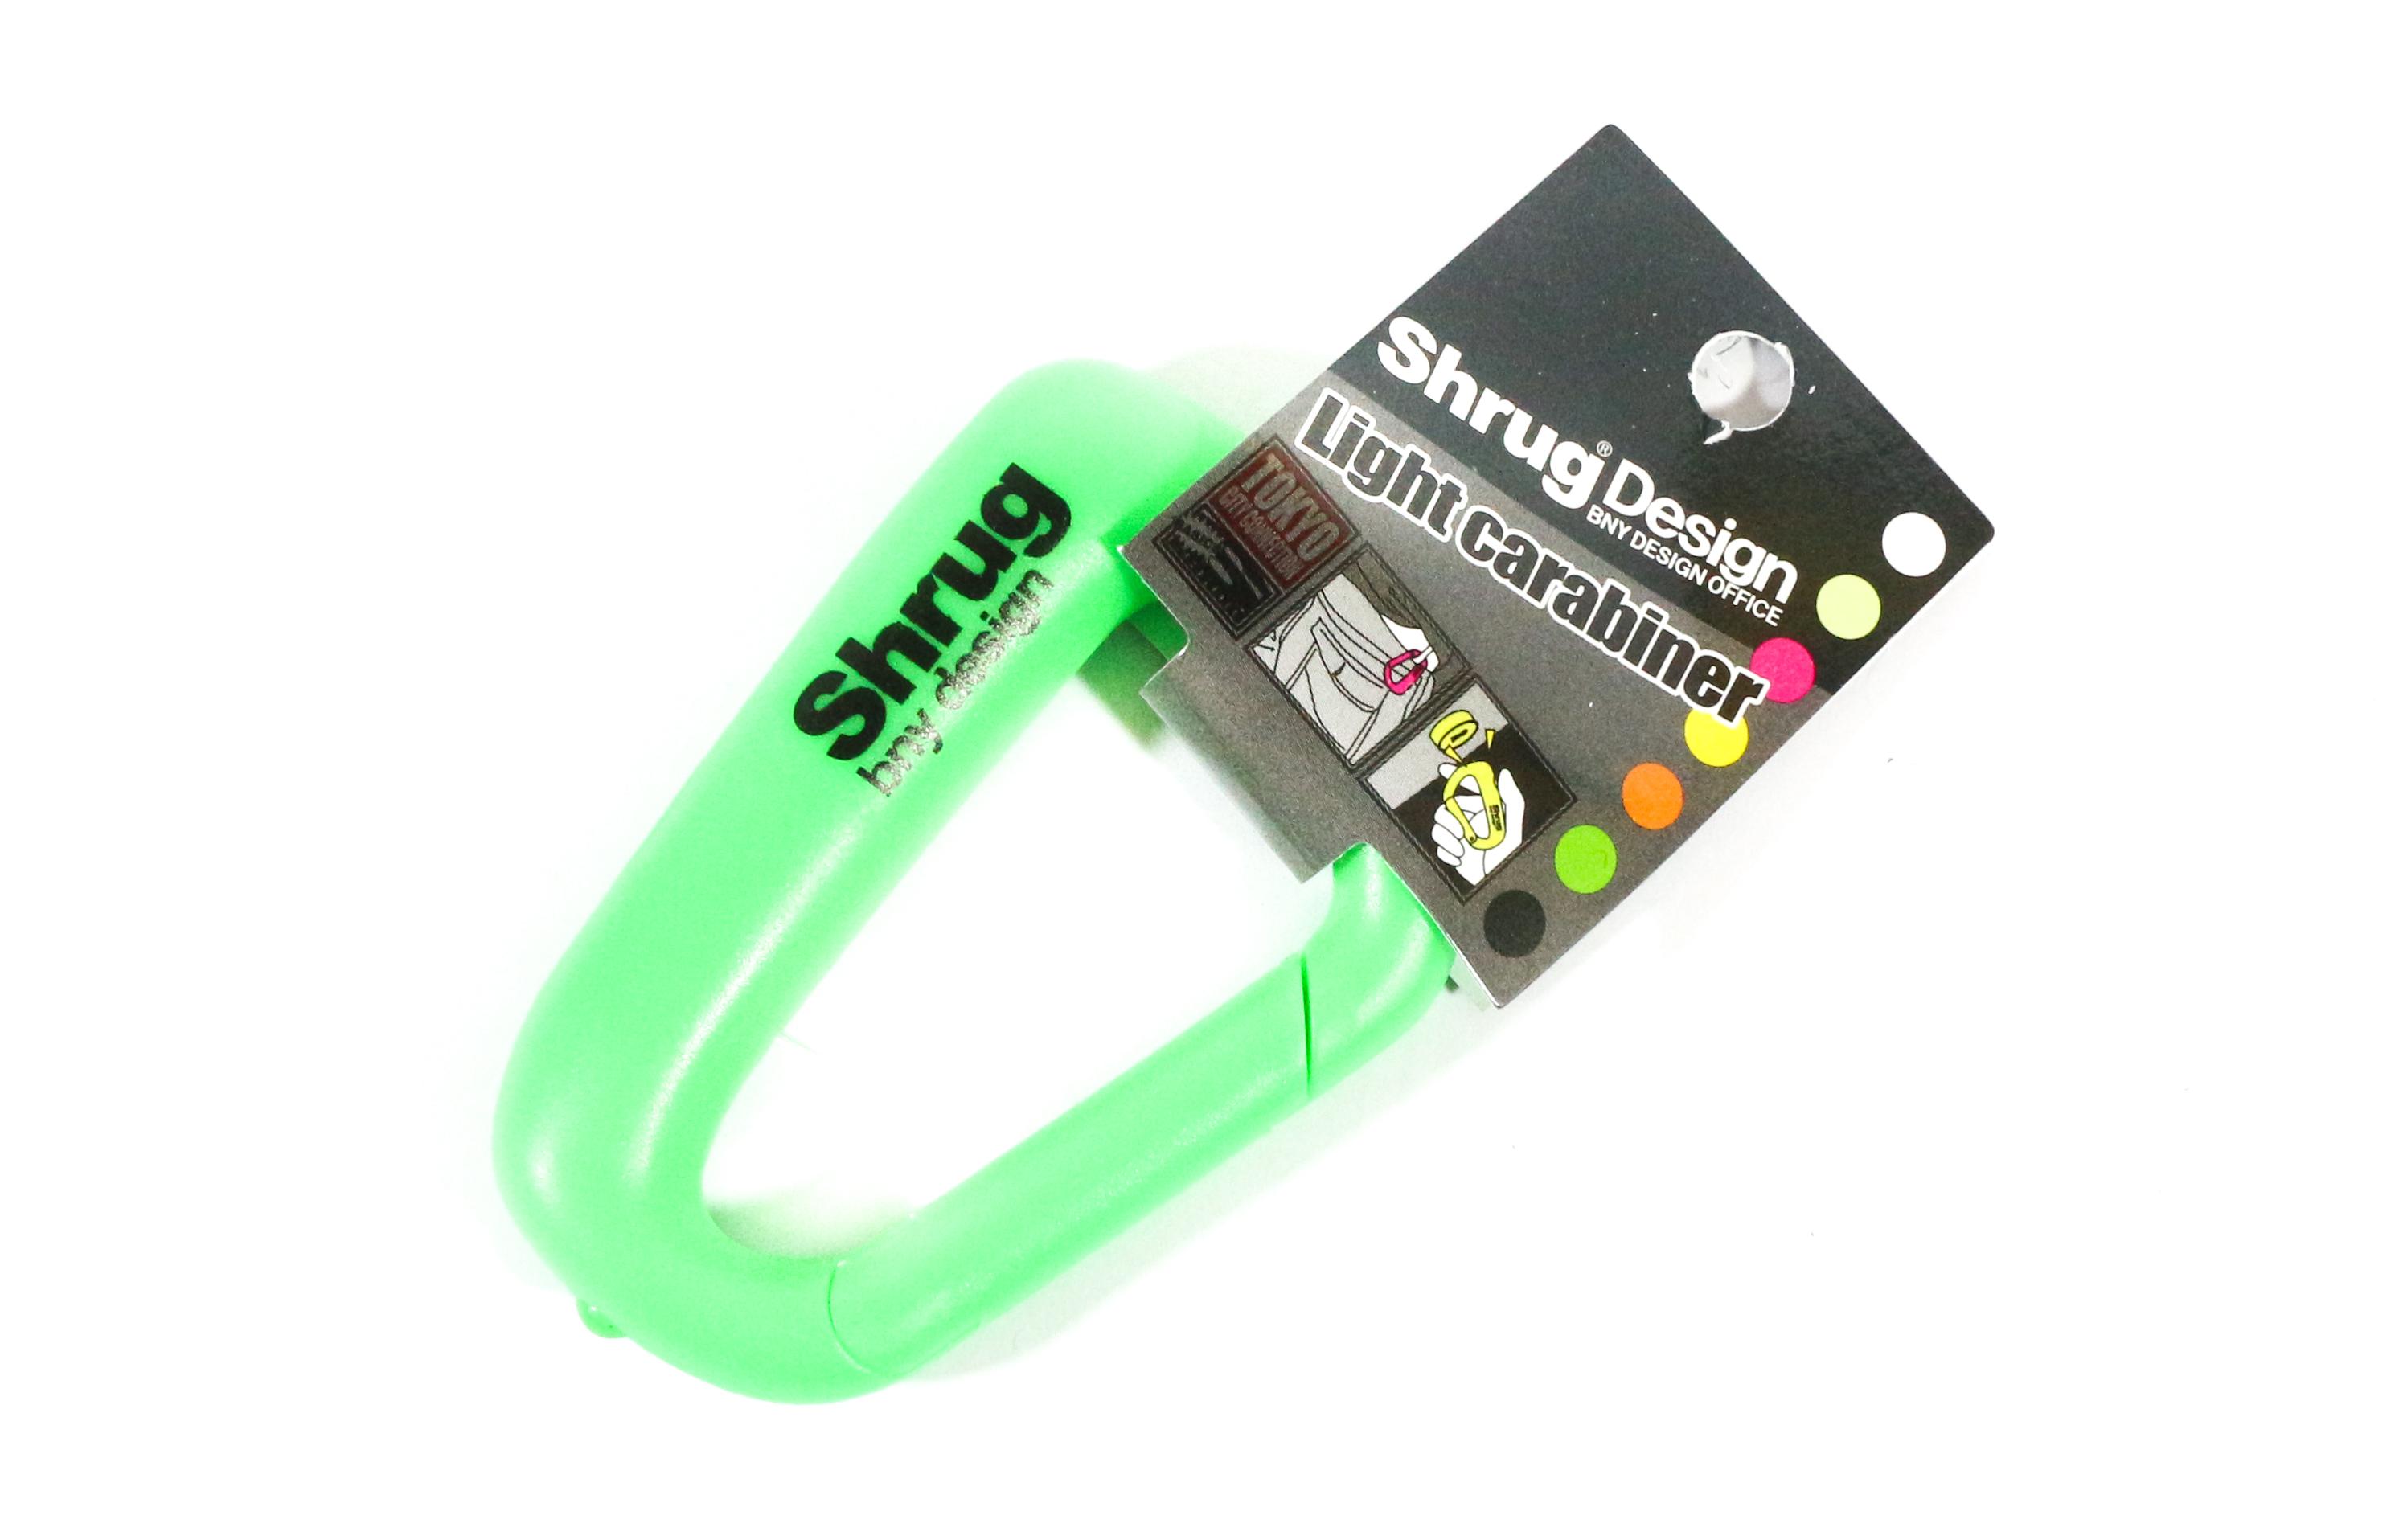 NOL Corp SHL-3-05 Shrug Light Carabina Neon Green (2800)